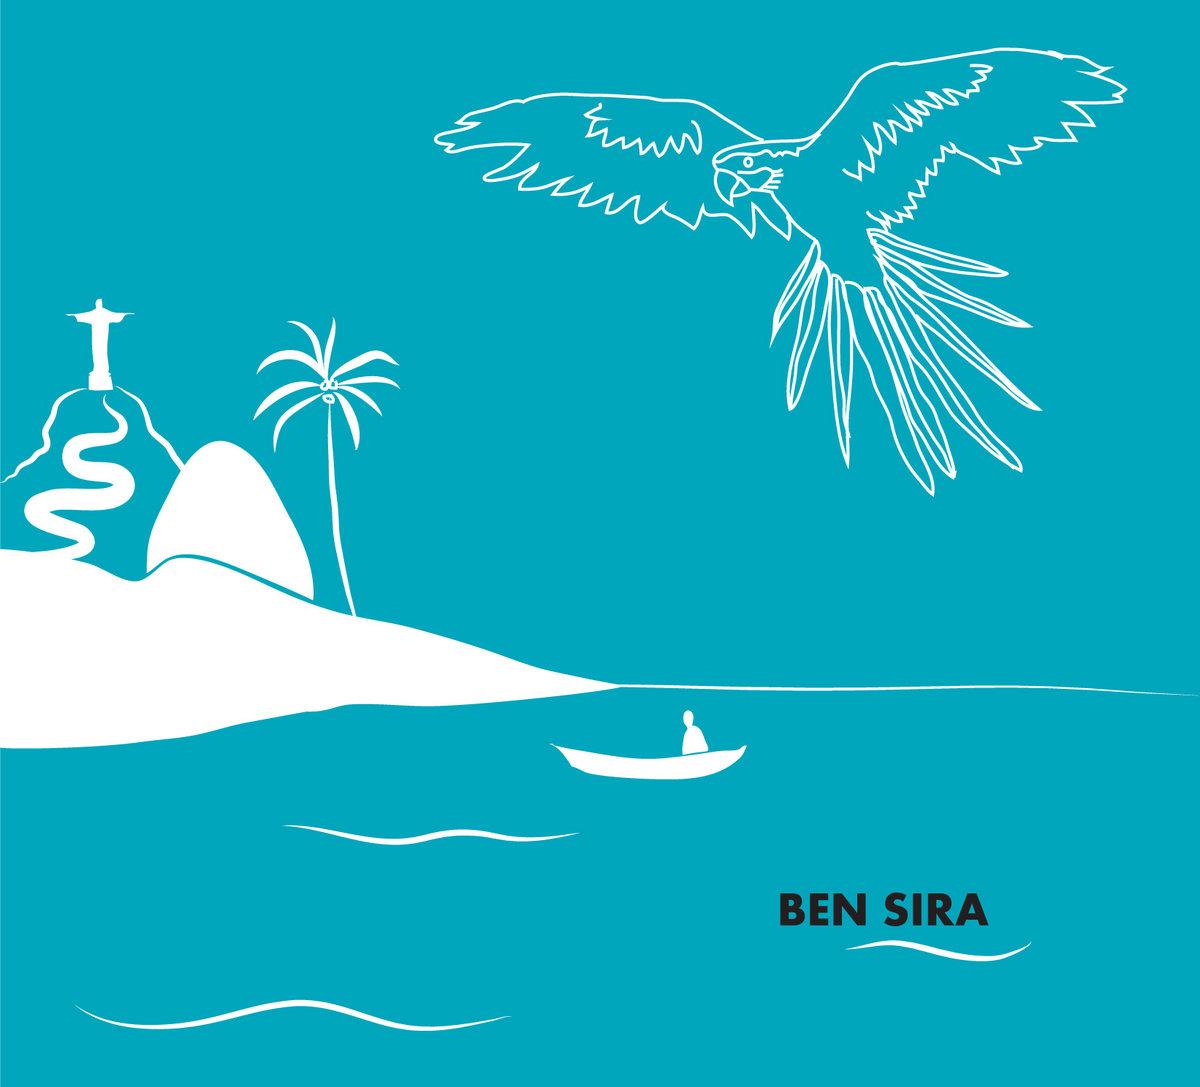 Ben Sira | Roee Ben Sira רועי בן סירה